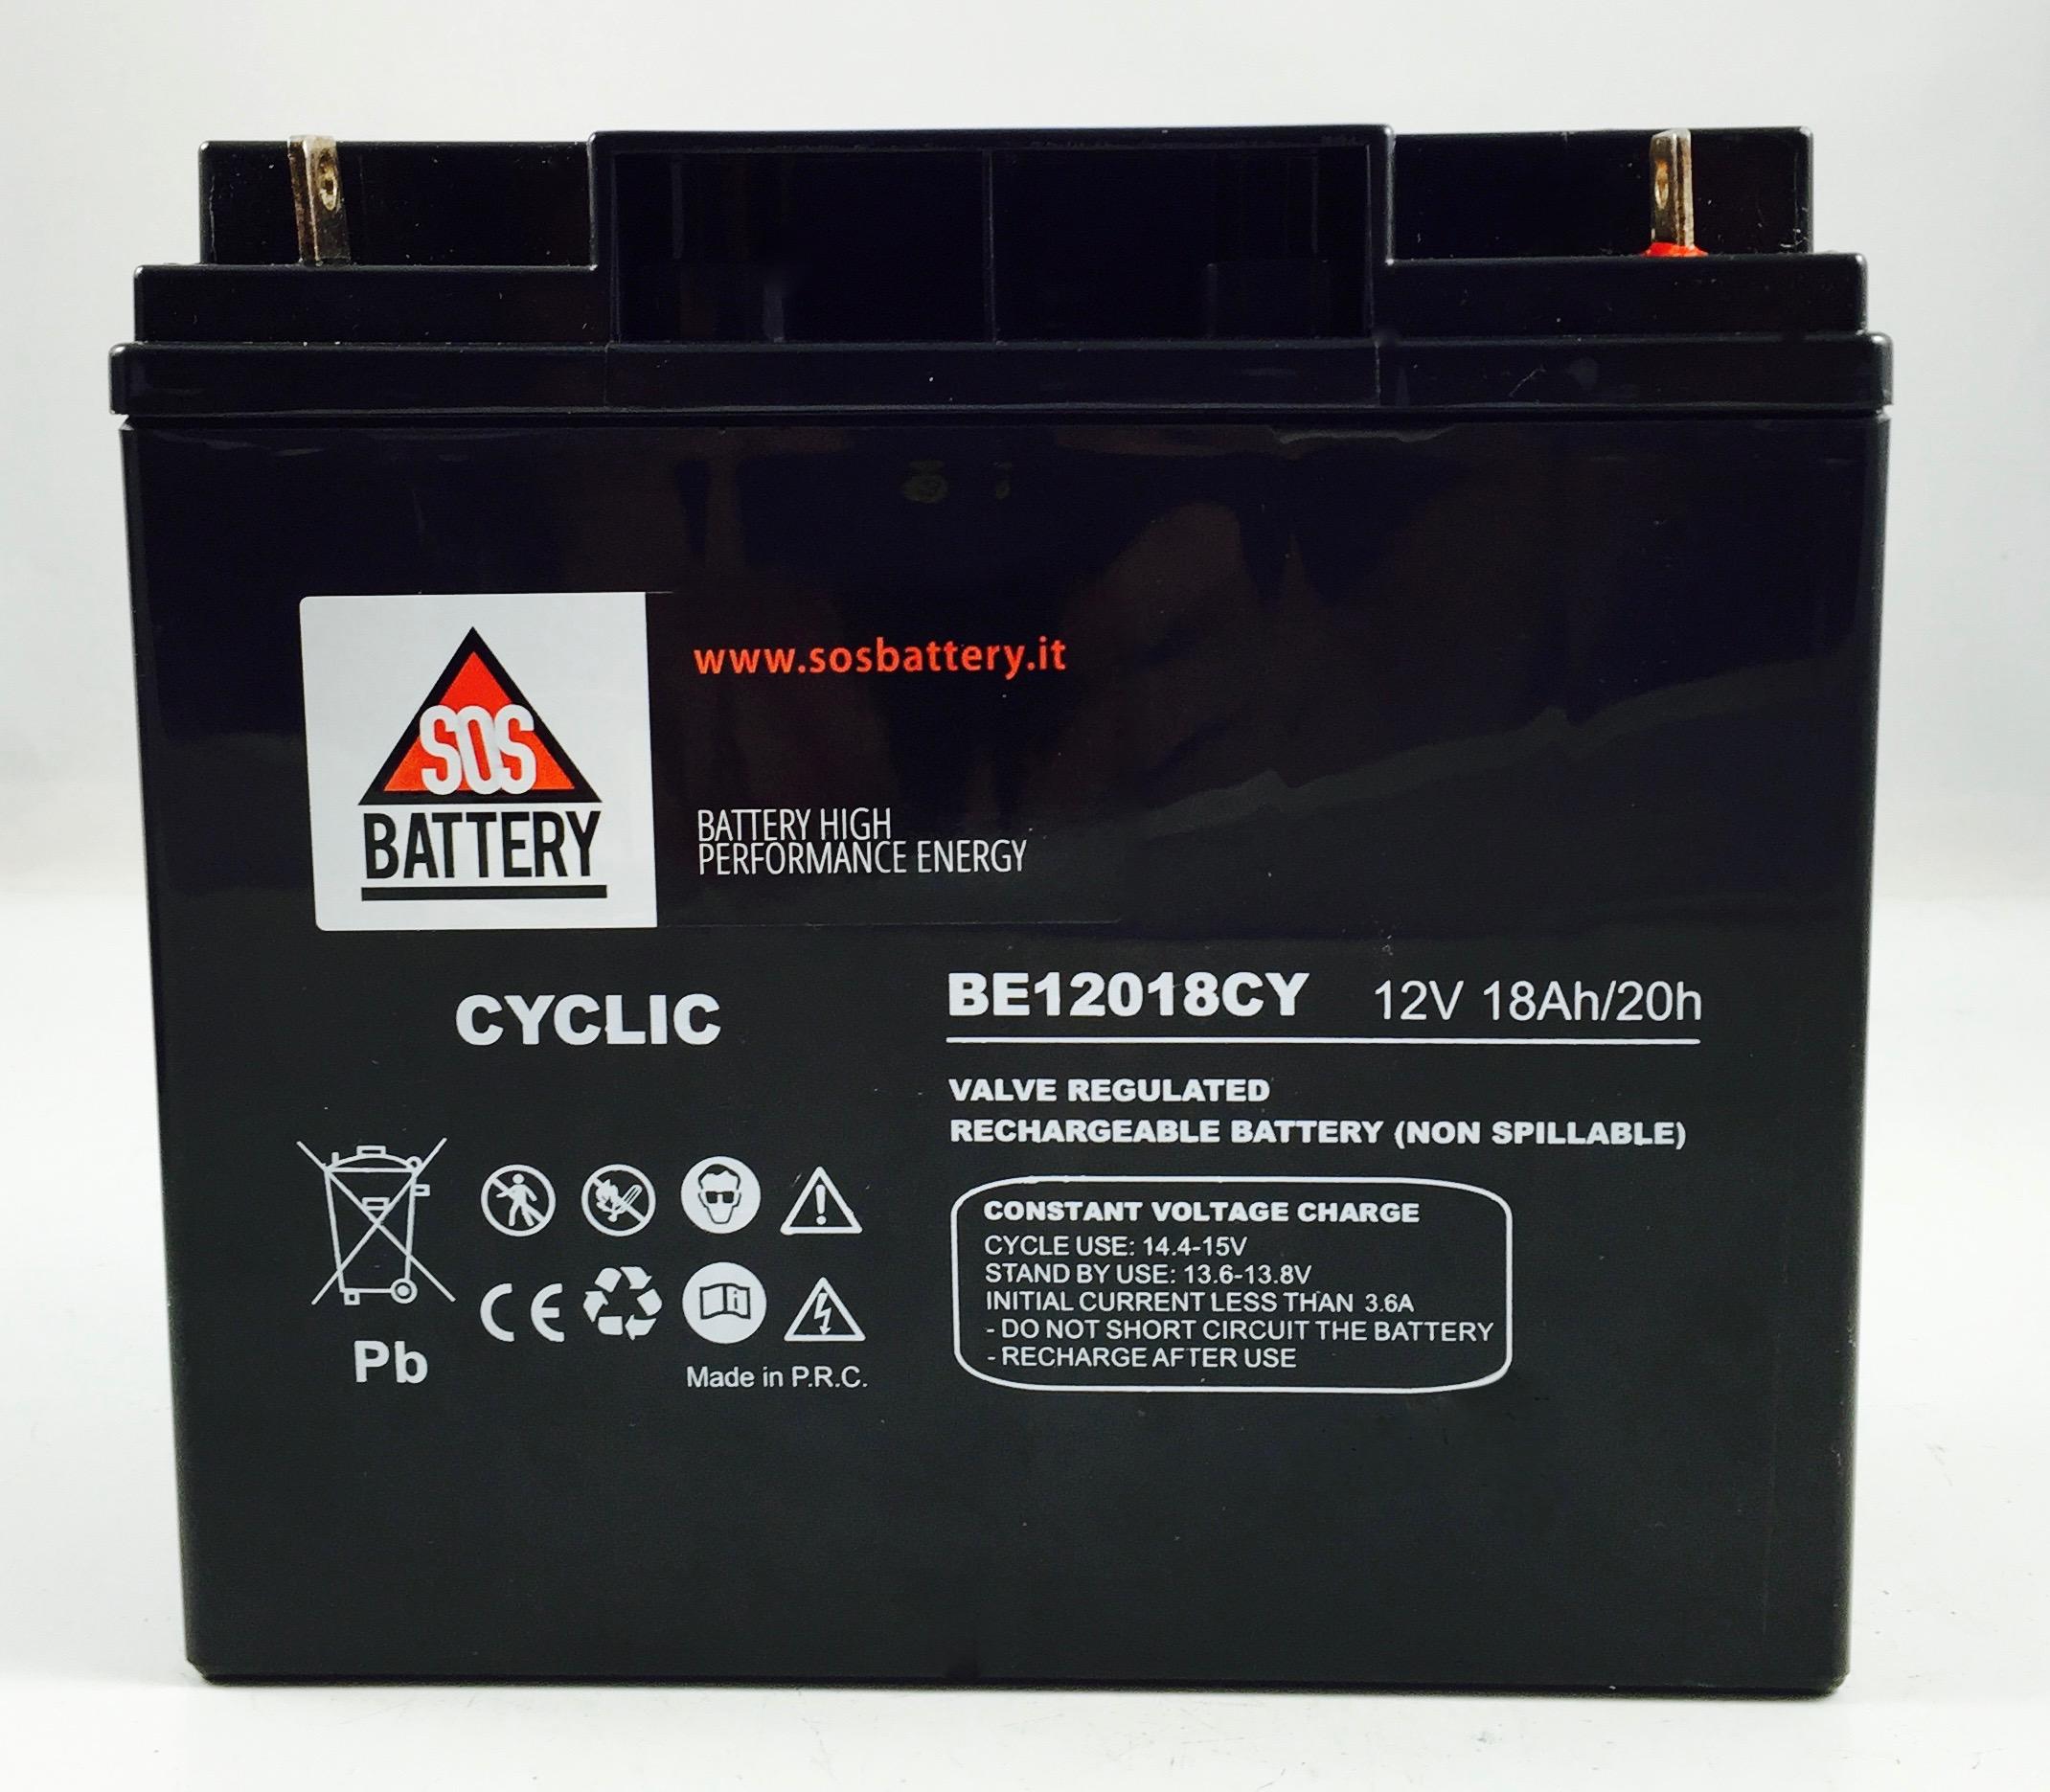 12v 18ah Battery >> BATTERIA AGM 12V 18AH BE12018CY   Sos Battery vendita ...